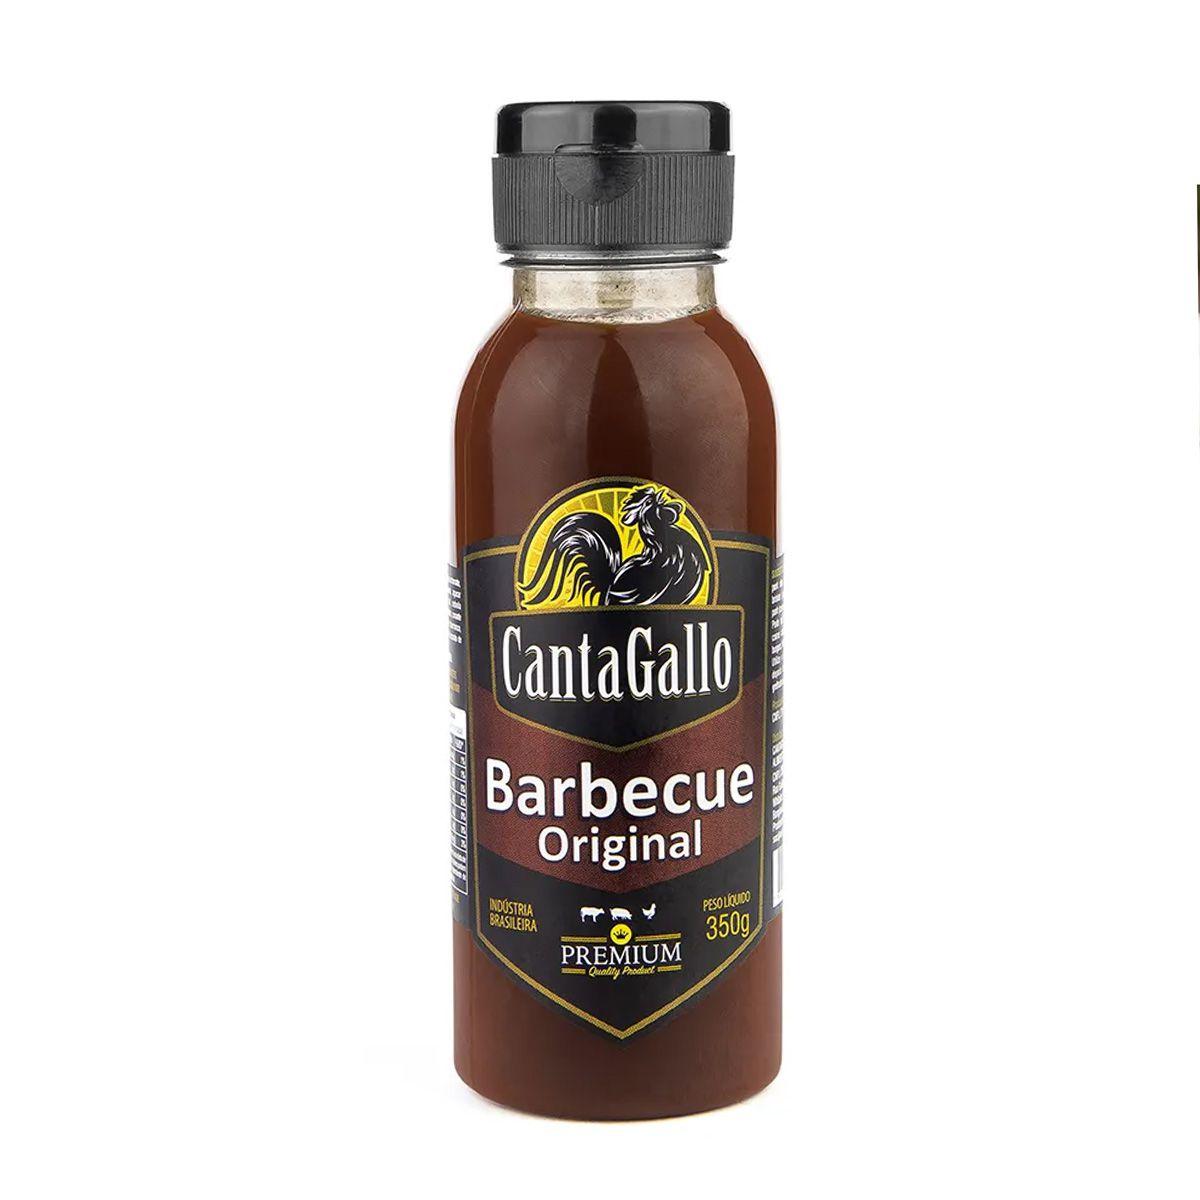 Molho Barbecue Cantagallo Original Premium 350g